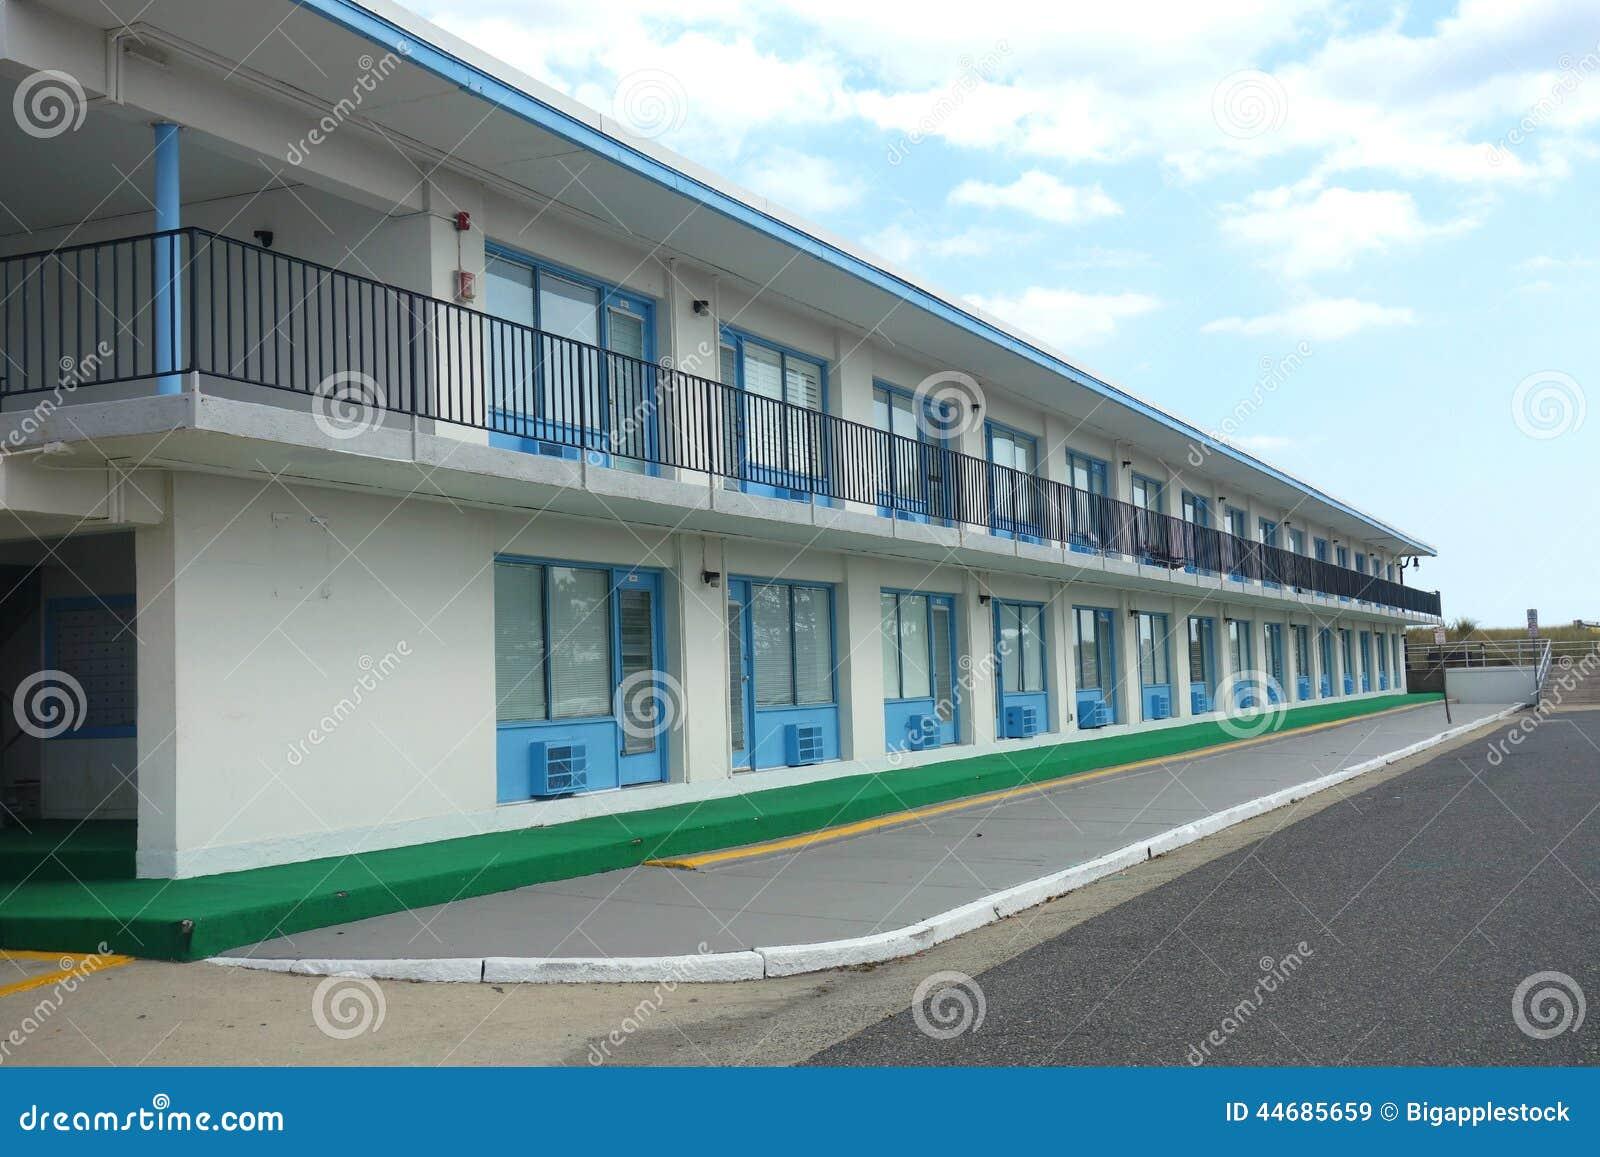 Cheap Rooms In Atlantic City